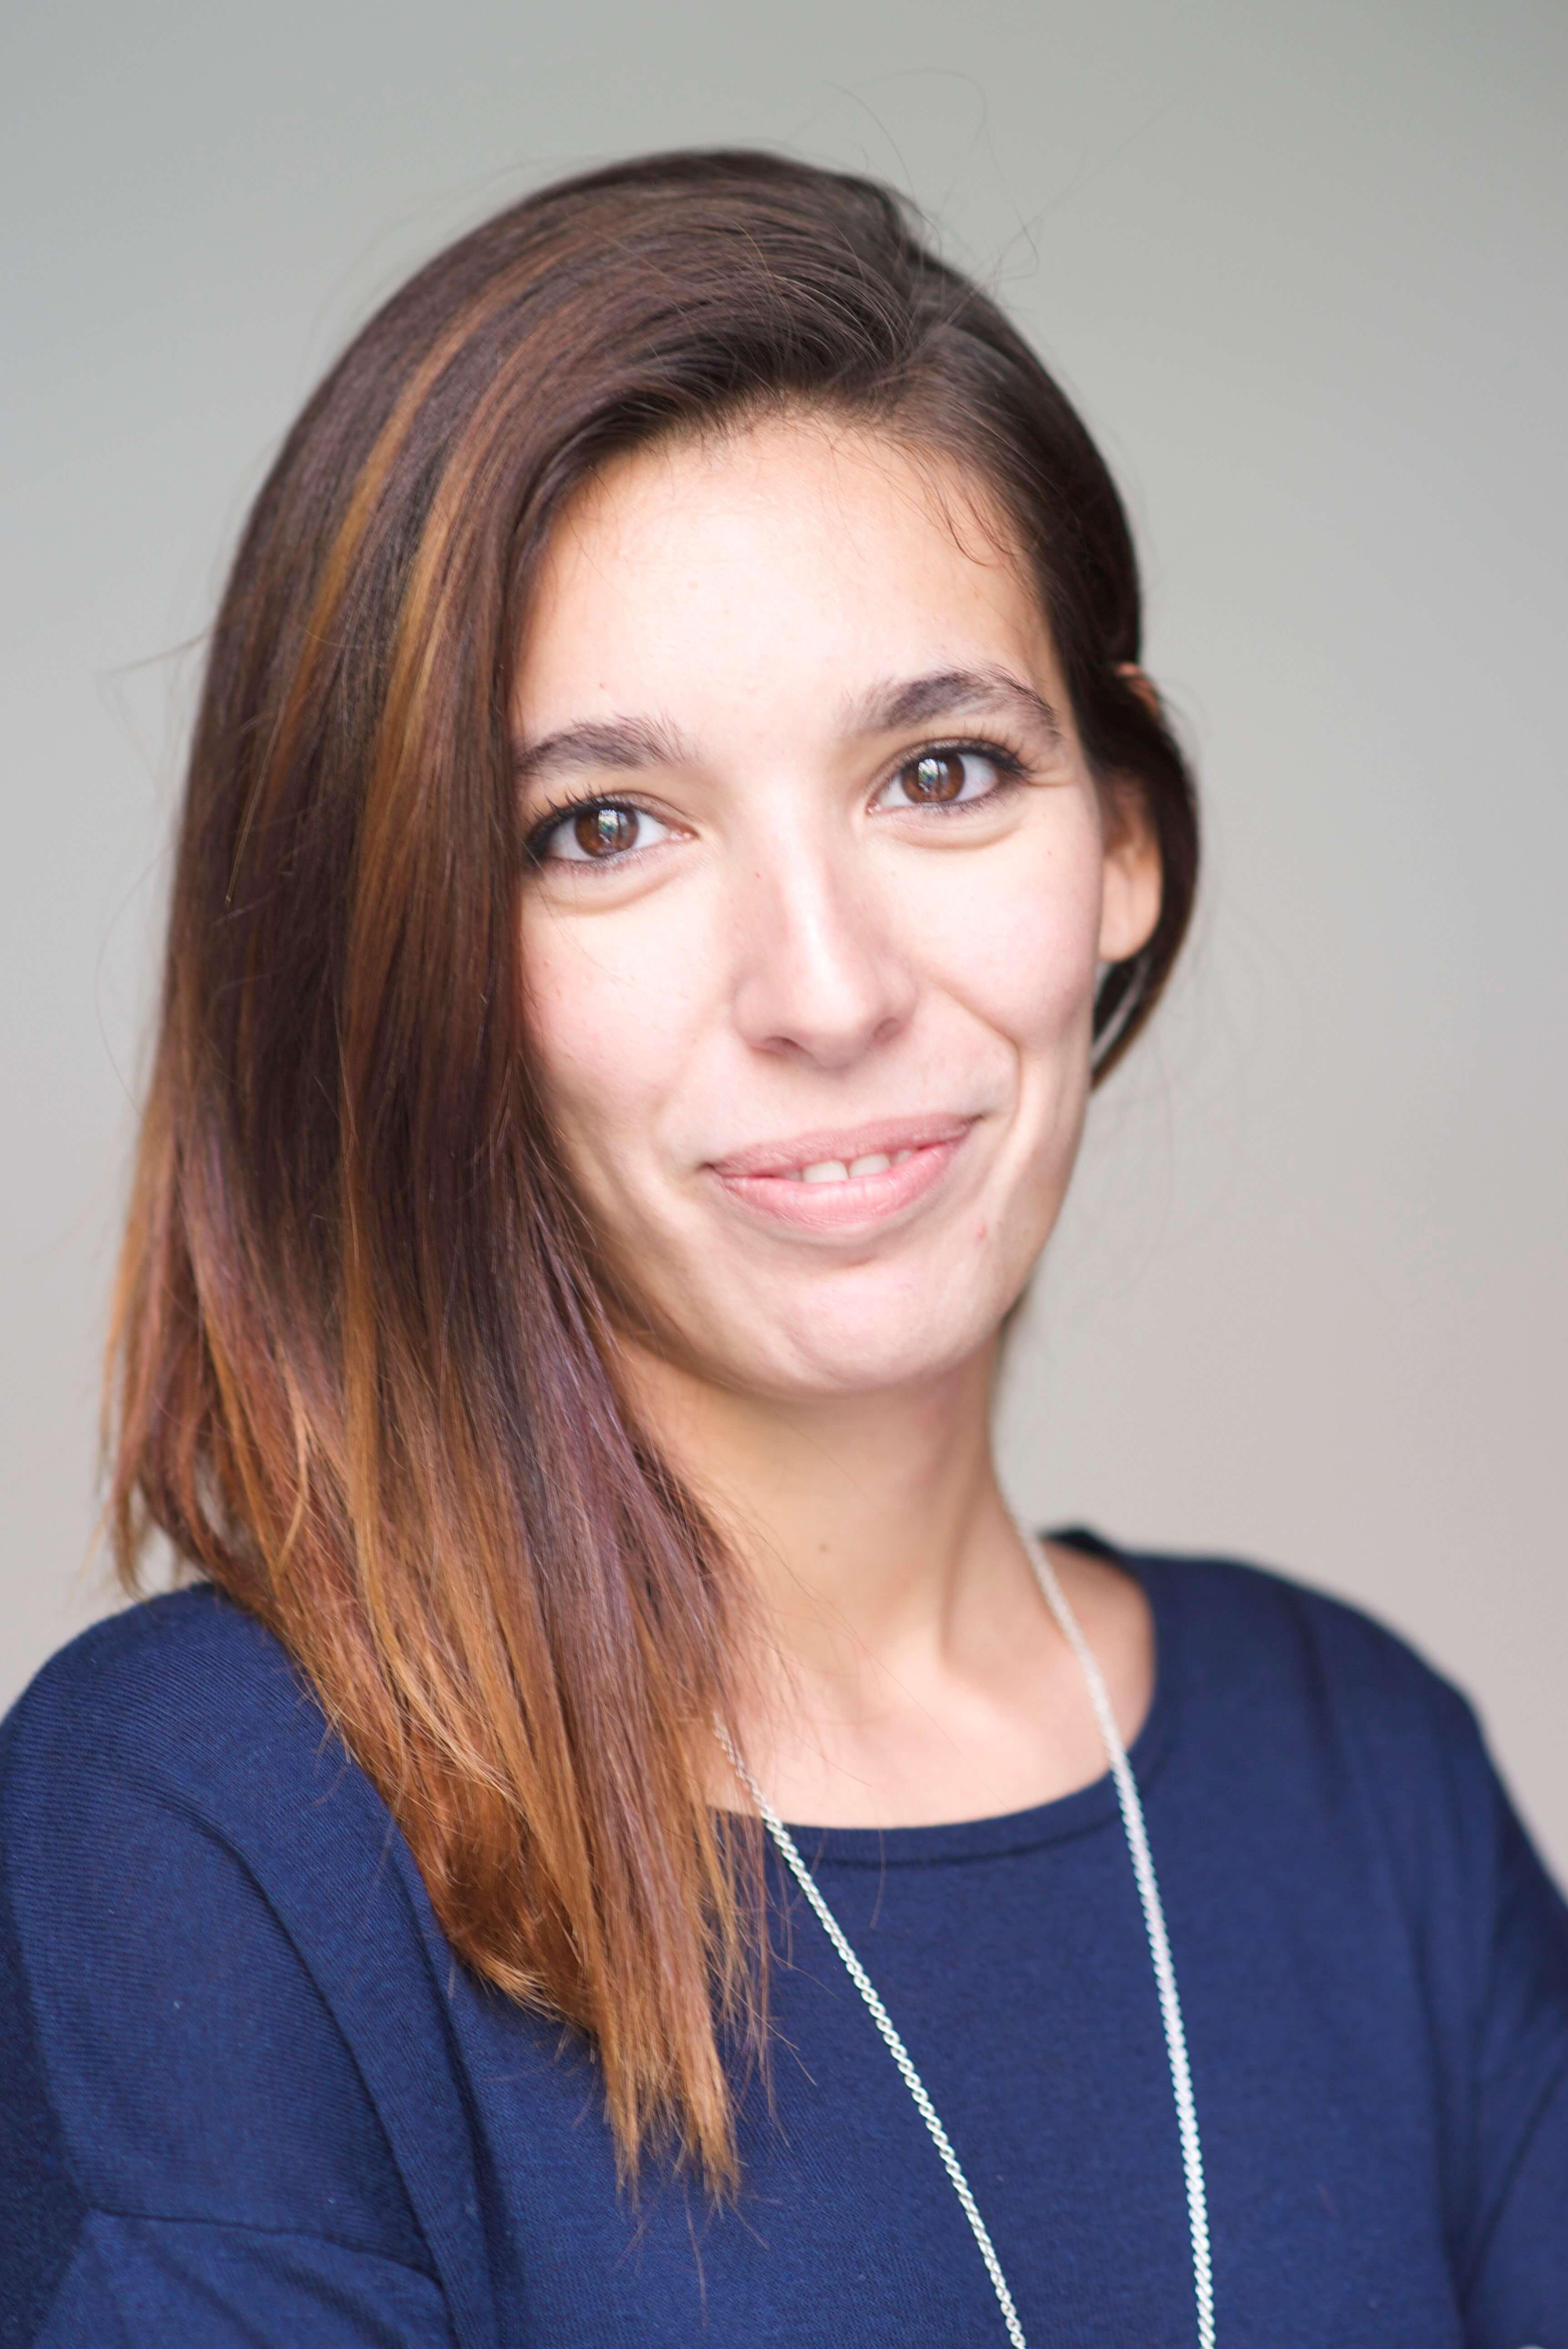 Susana Gracia